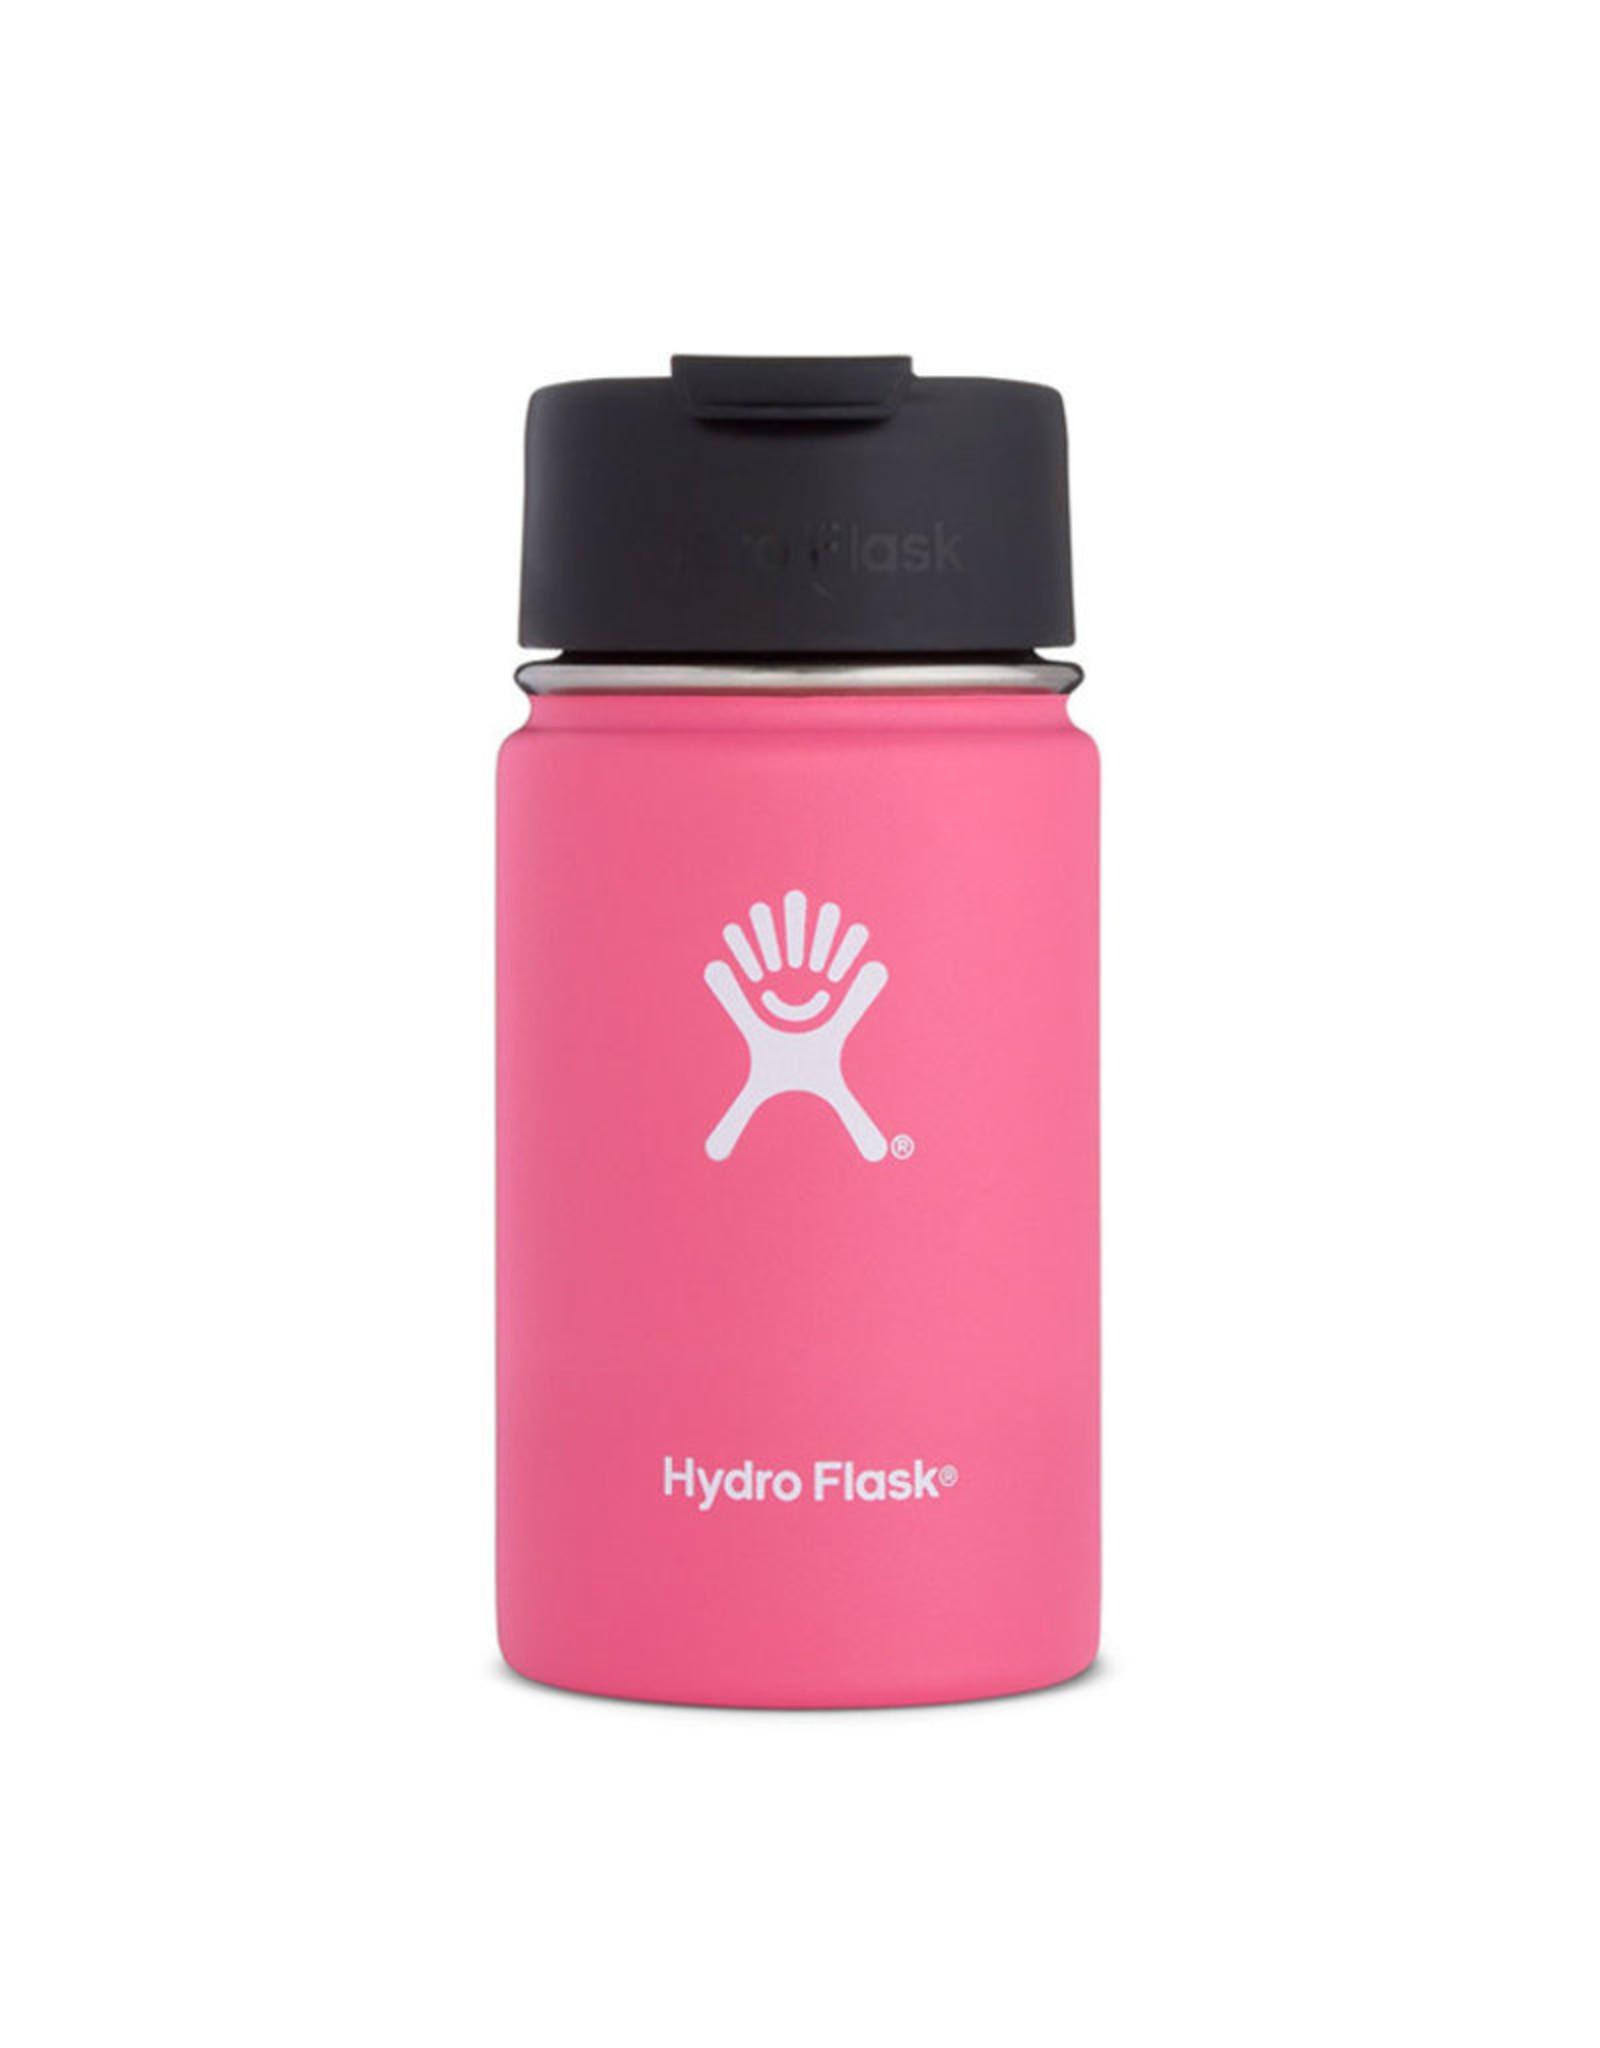 Hydro Flask hydro Flask - 12 oz. Wide Mouth w/Flip Lid